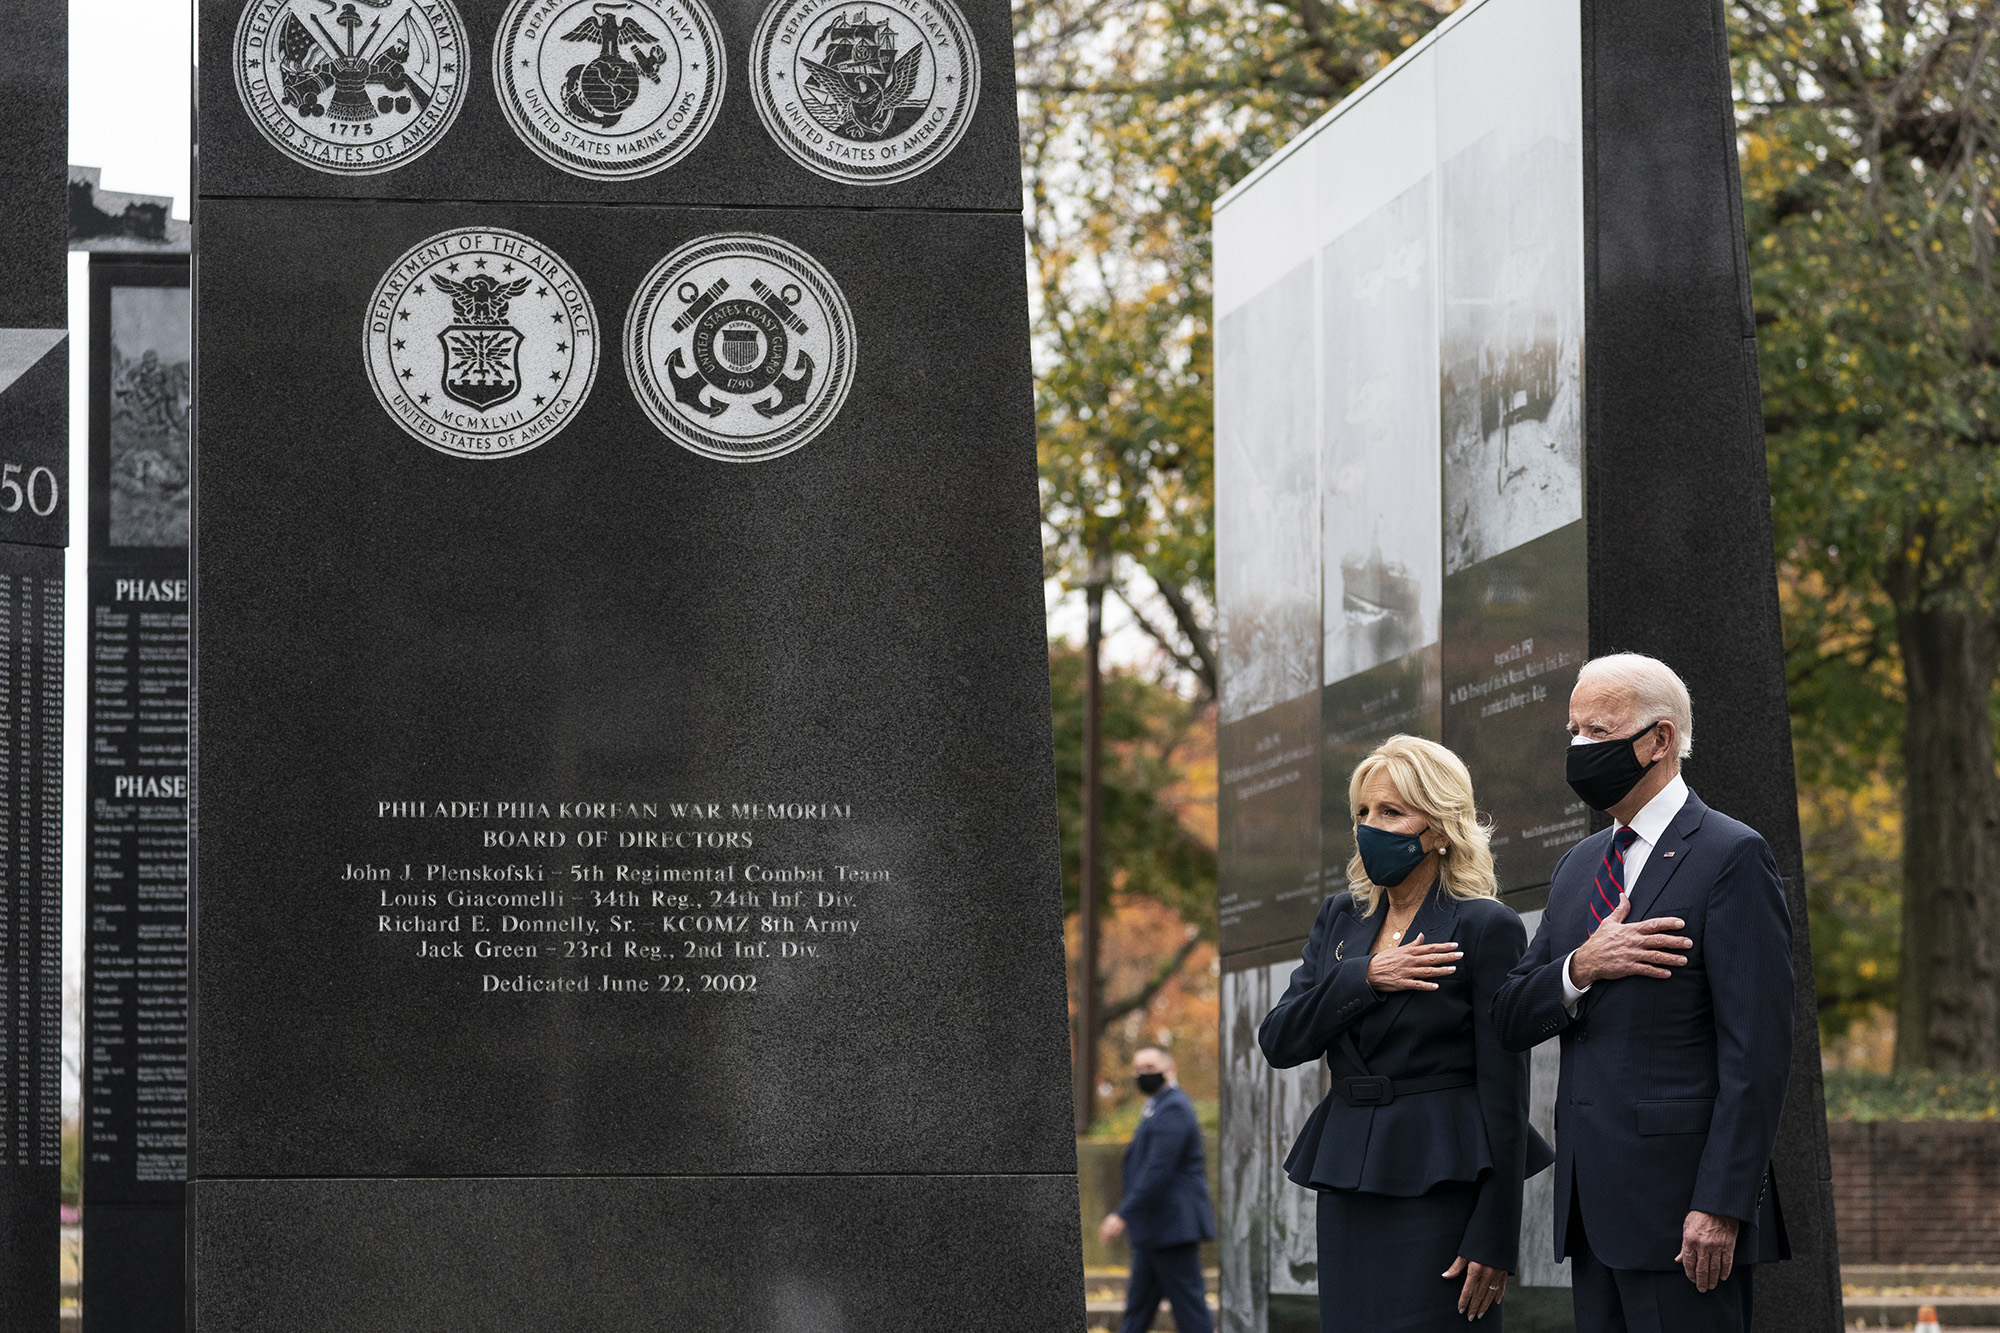 President-elect Joe Biden, and Jill Biden, stand with their hands over their hearts before placing a wreath at the Philadelphia Korean War Memorial at Penn's Landing, on Veterans Day, Wednesday, Nov. 11, 2020, in Philadelphia. (Alex Brandon/AP)